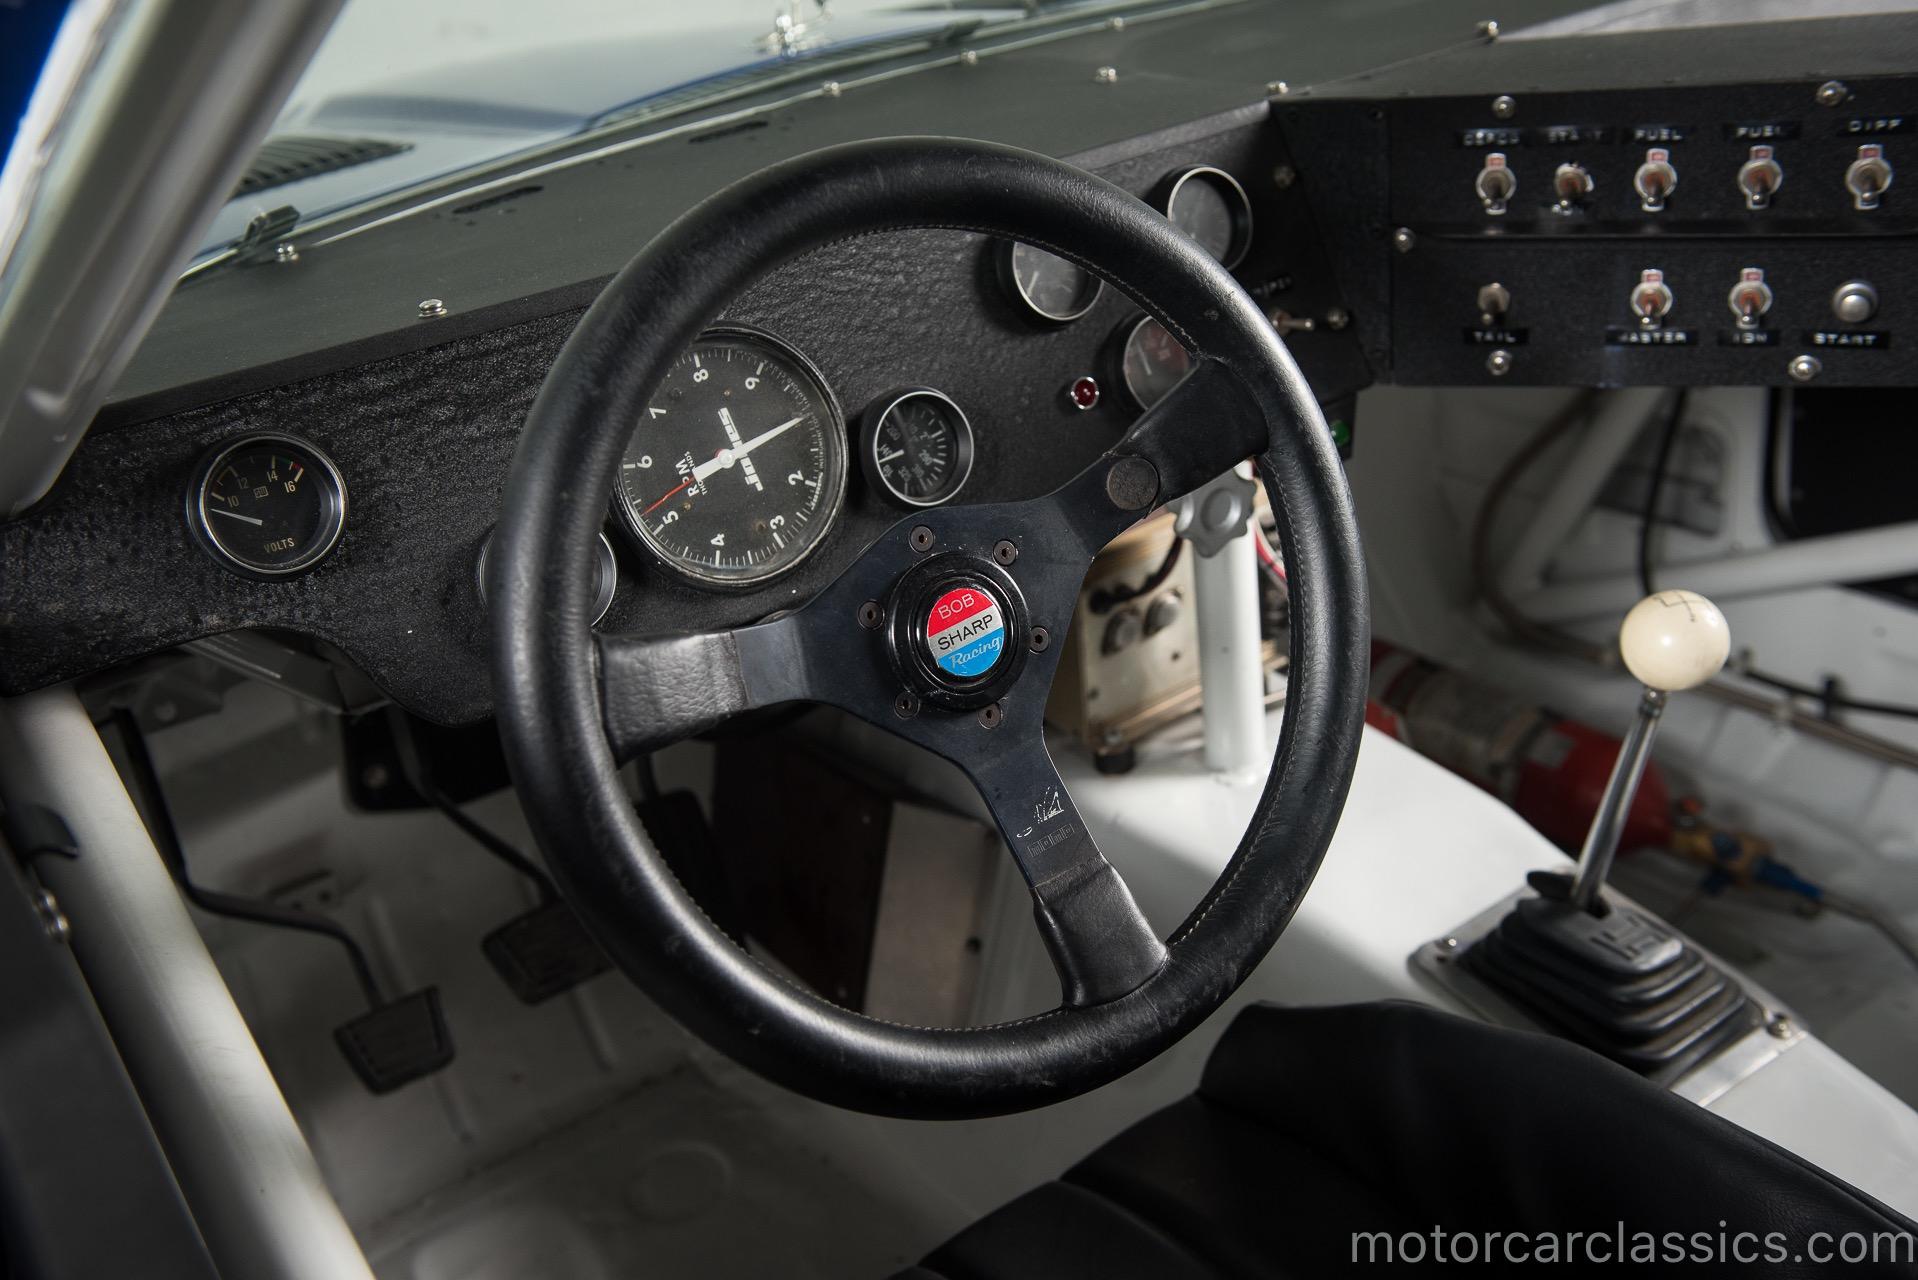 1979 Datsun 280ZX Paul Newman Championship Racecar